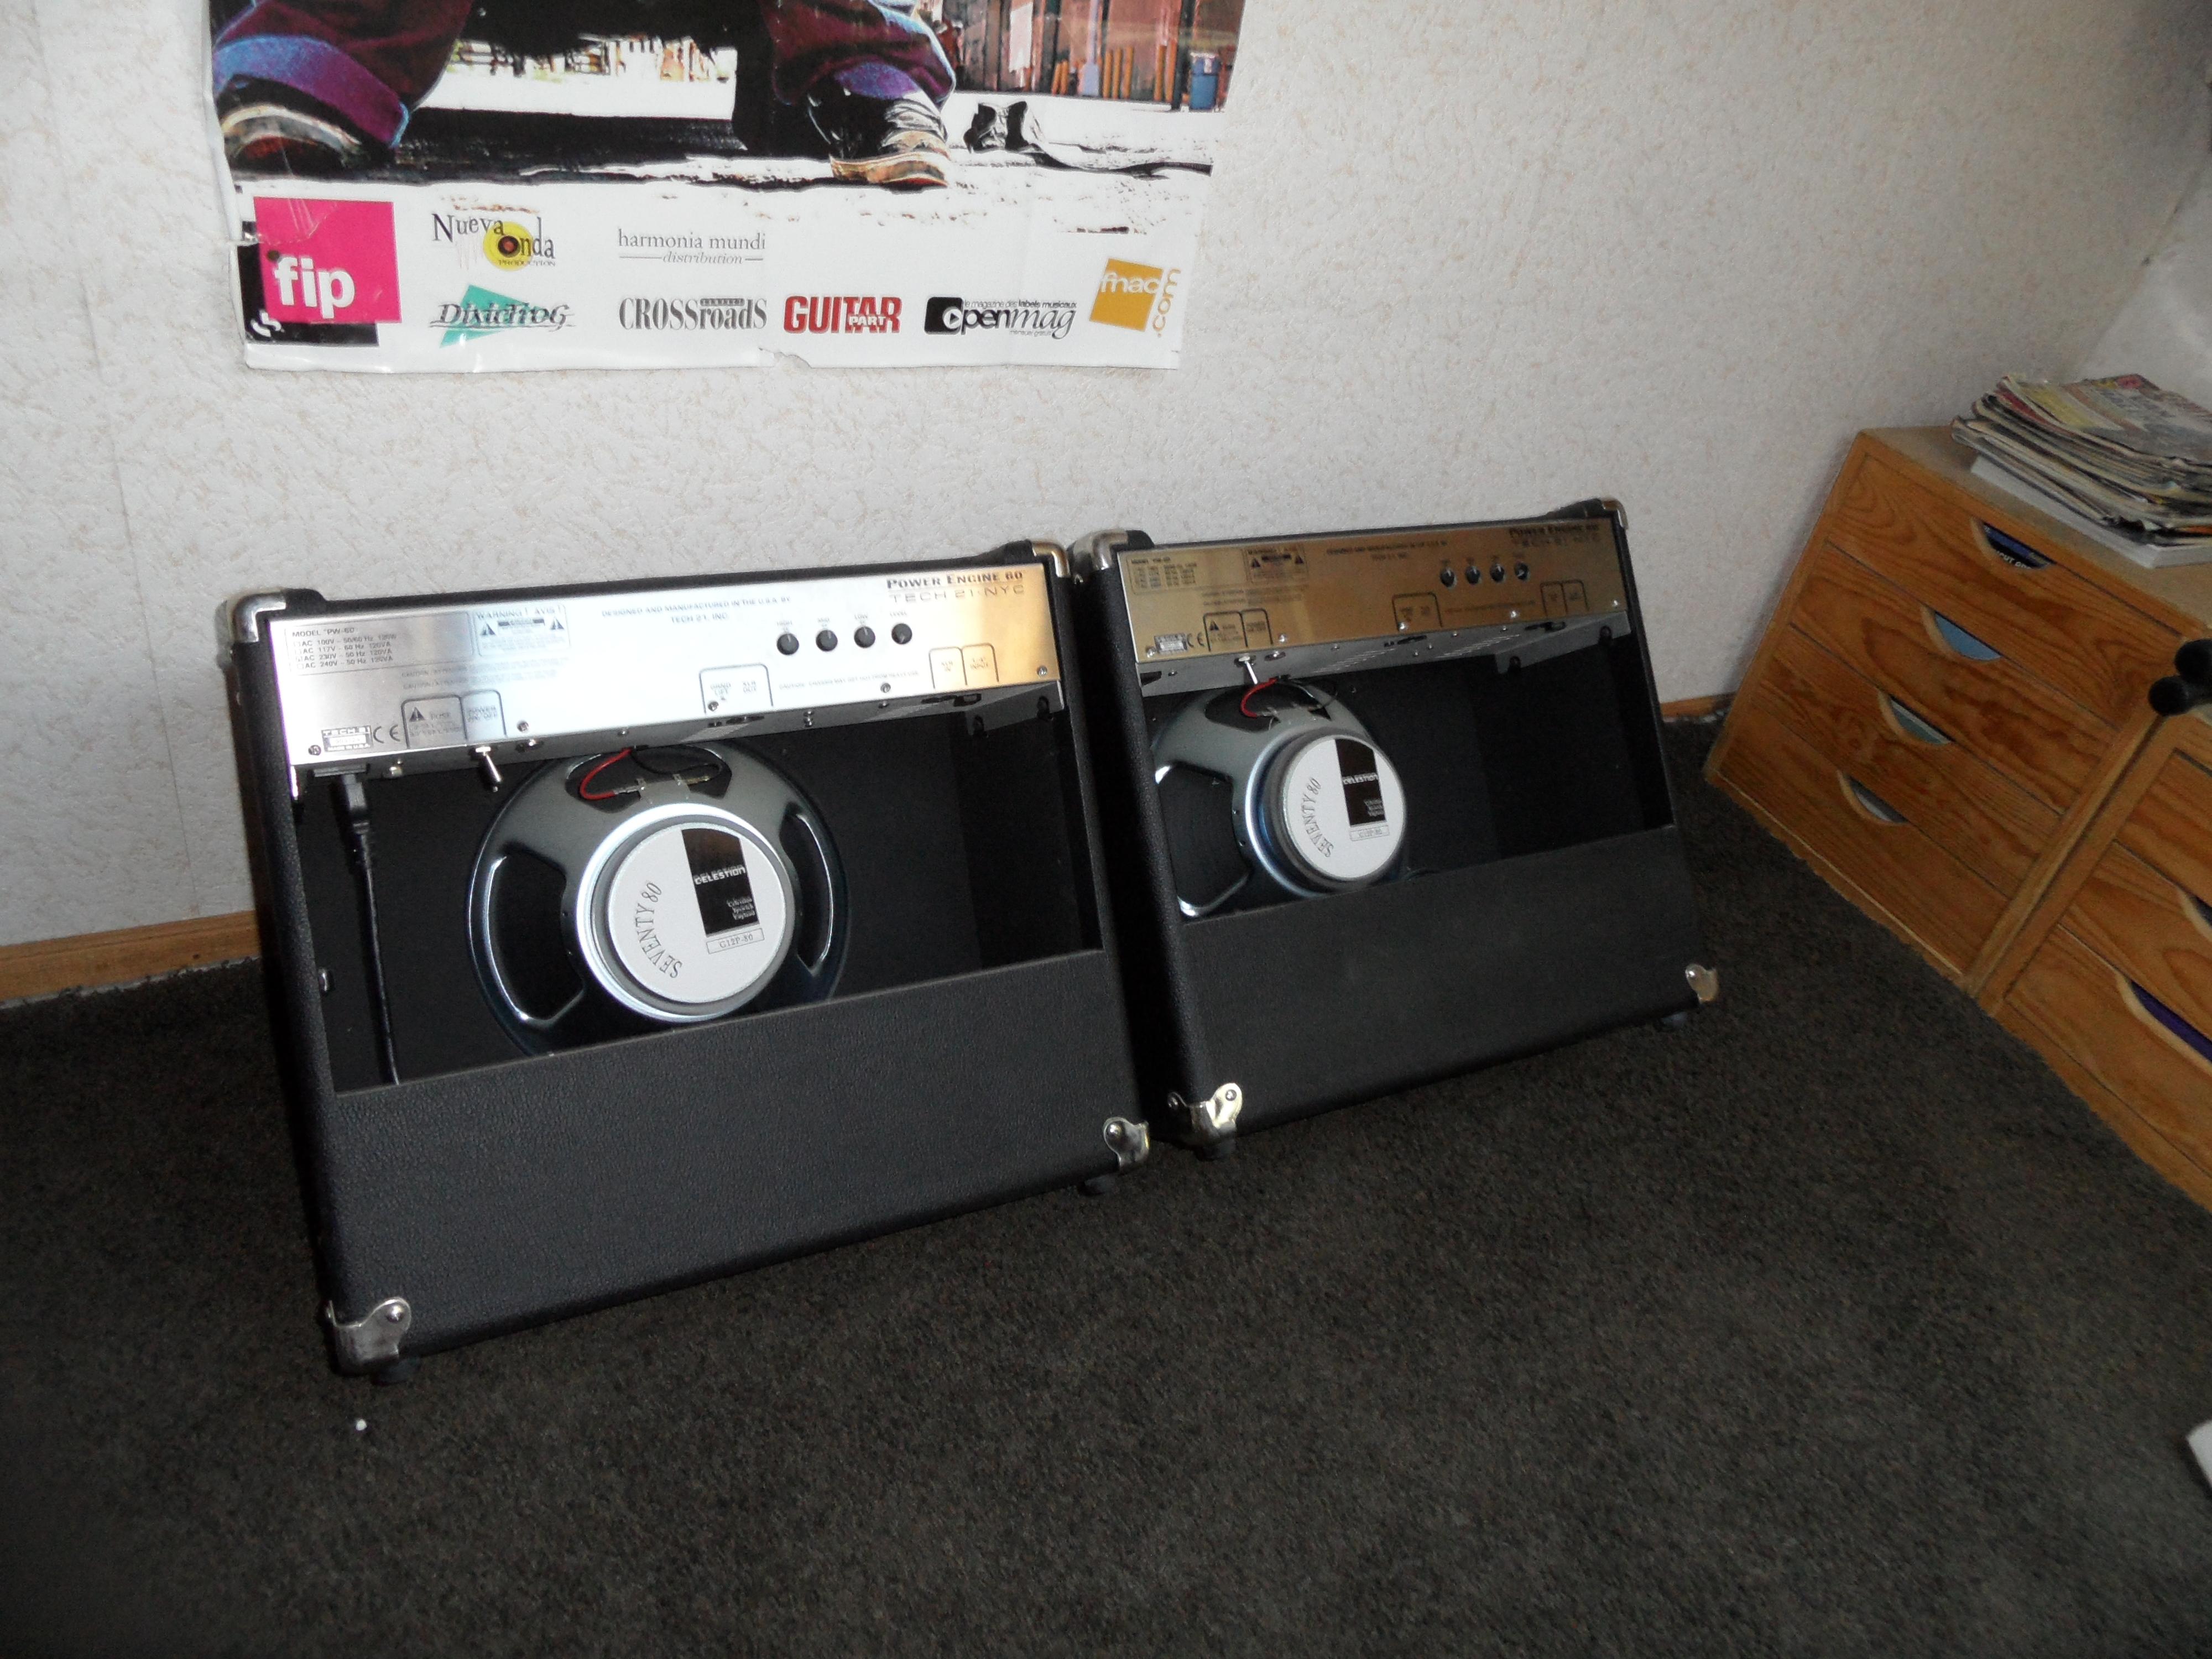 tech 21 power engine 60 1x12 image 1512082 audiofanzine. Black Bedroom Furniture Sets. Home Design Ideas